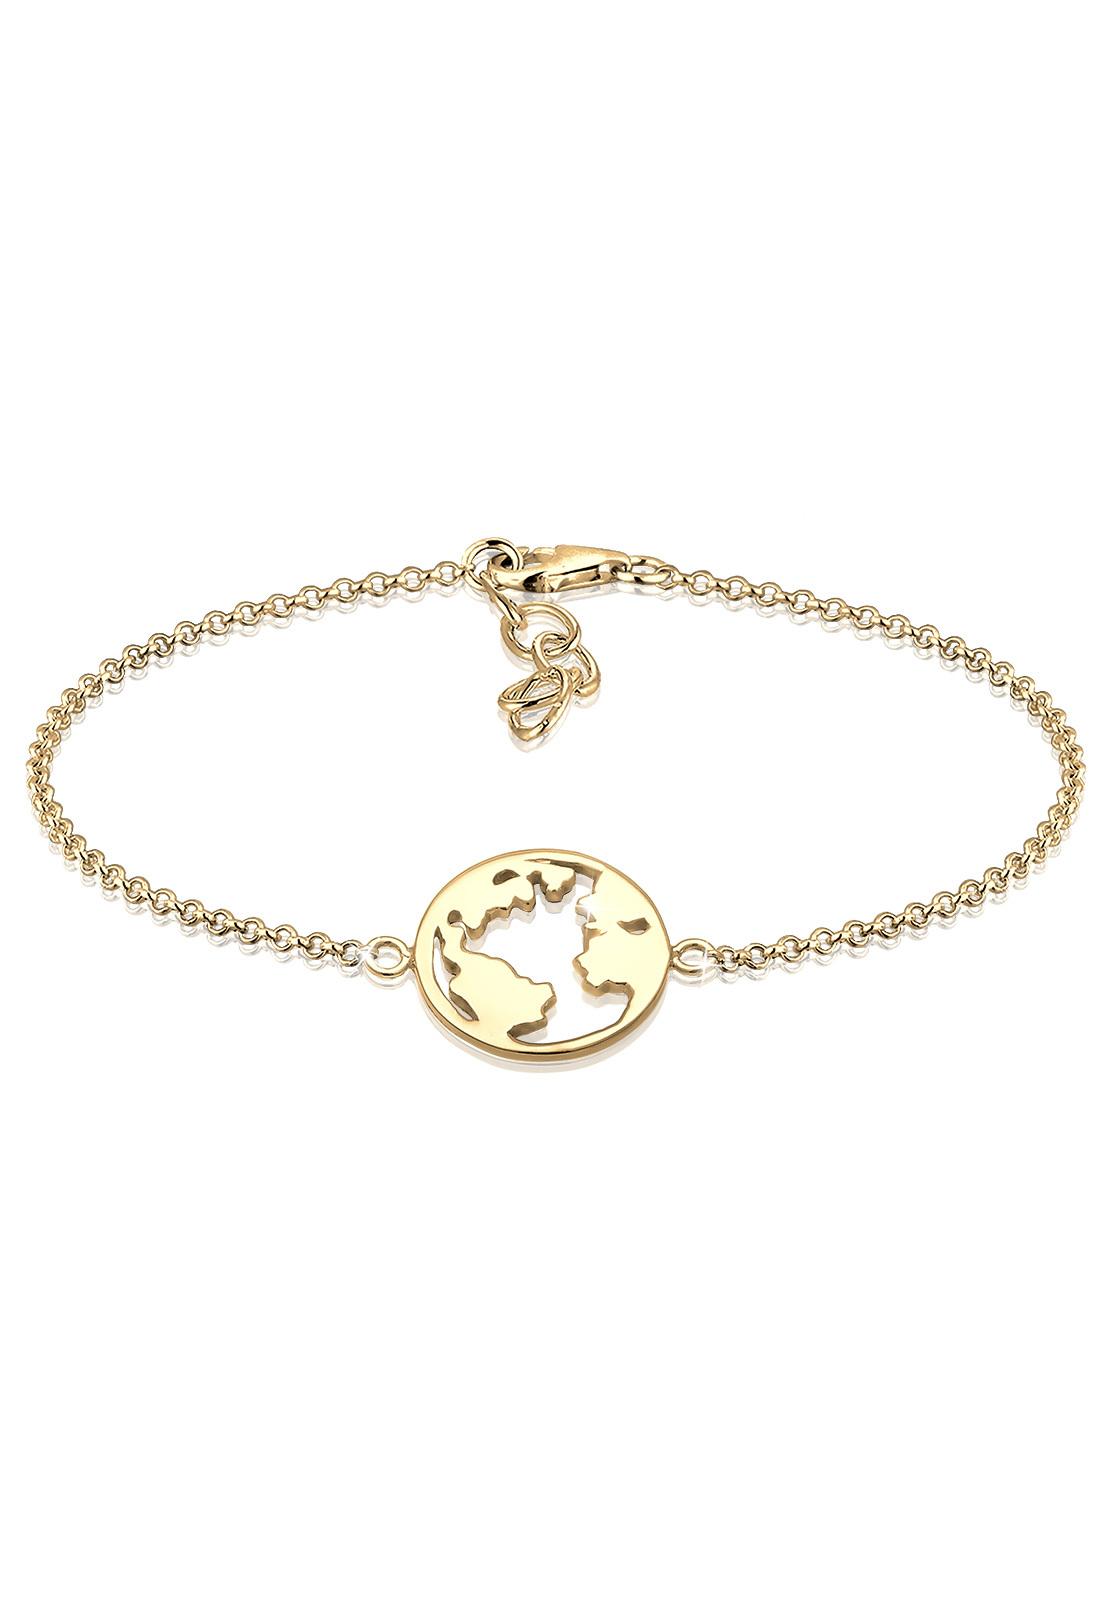 Armband Weltkugel | 925 Sterling Silber vergoldet